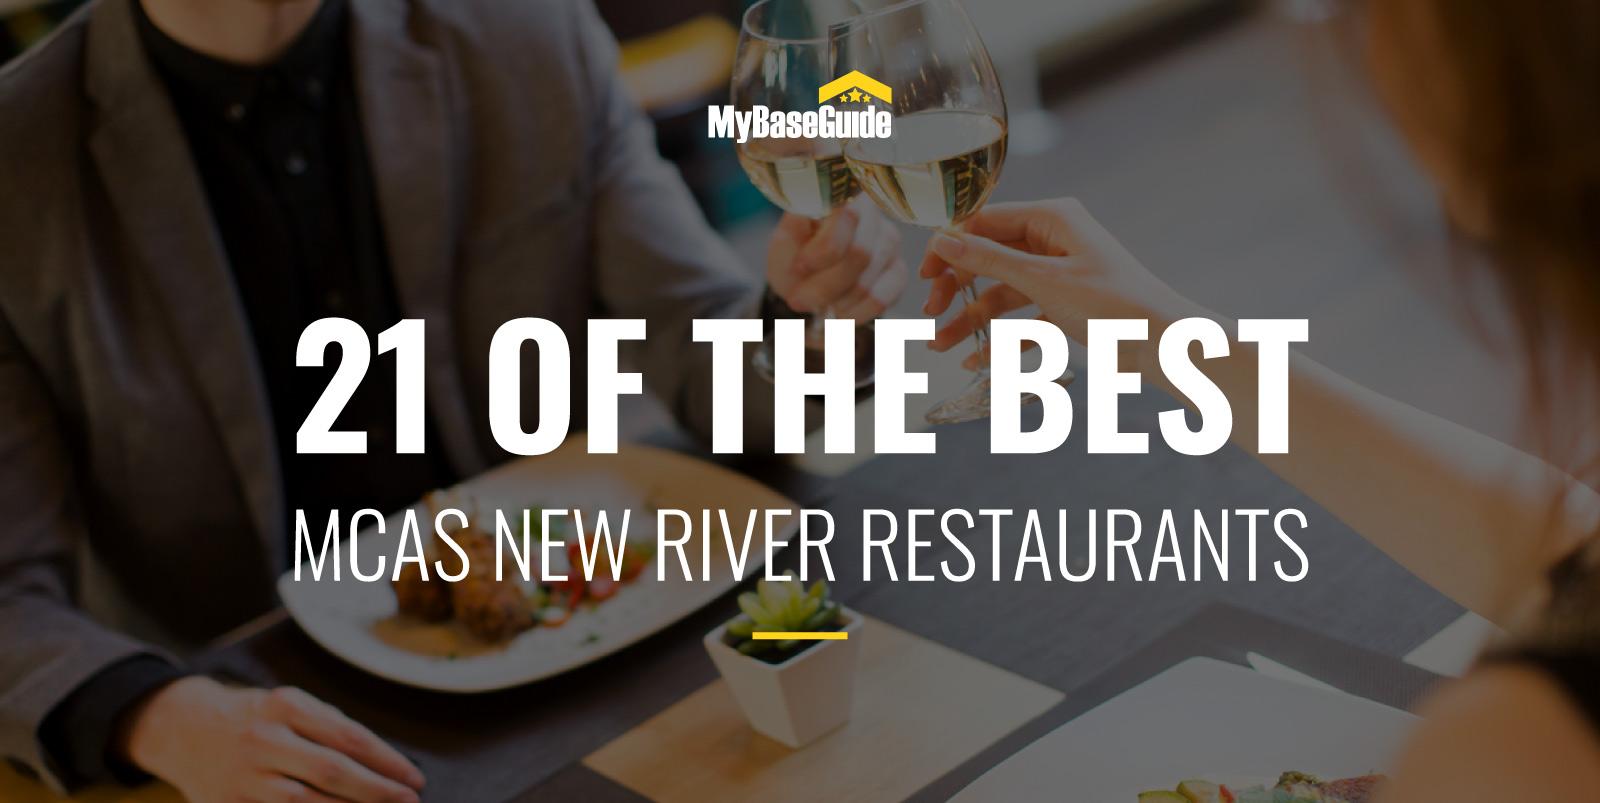 21 of the Best MCAS New River Restaurants